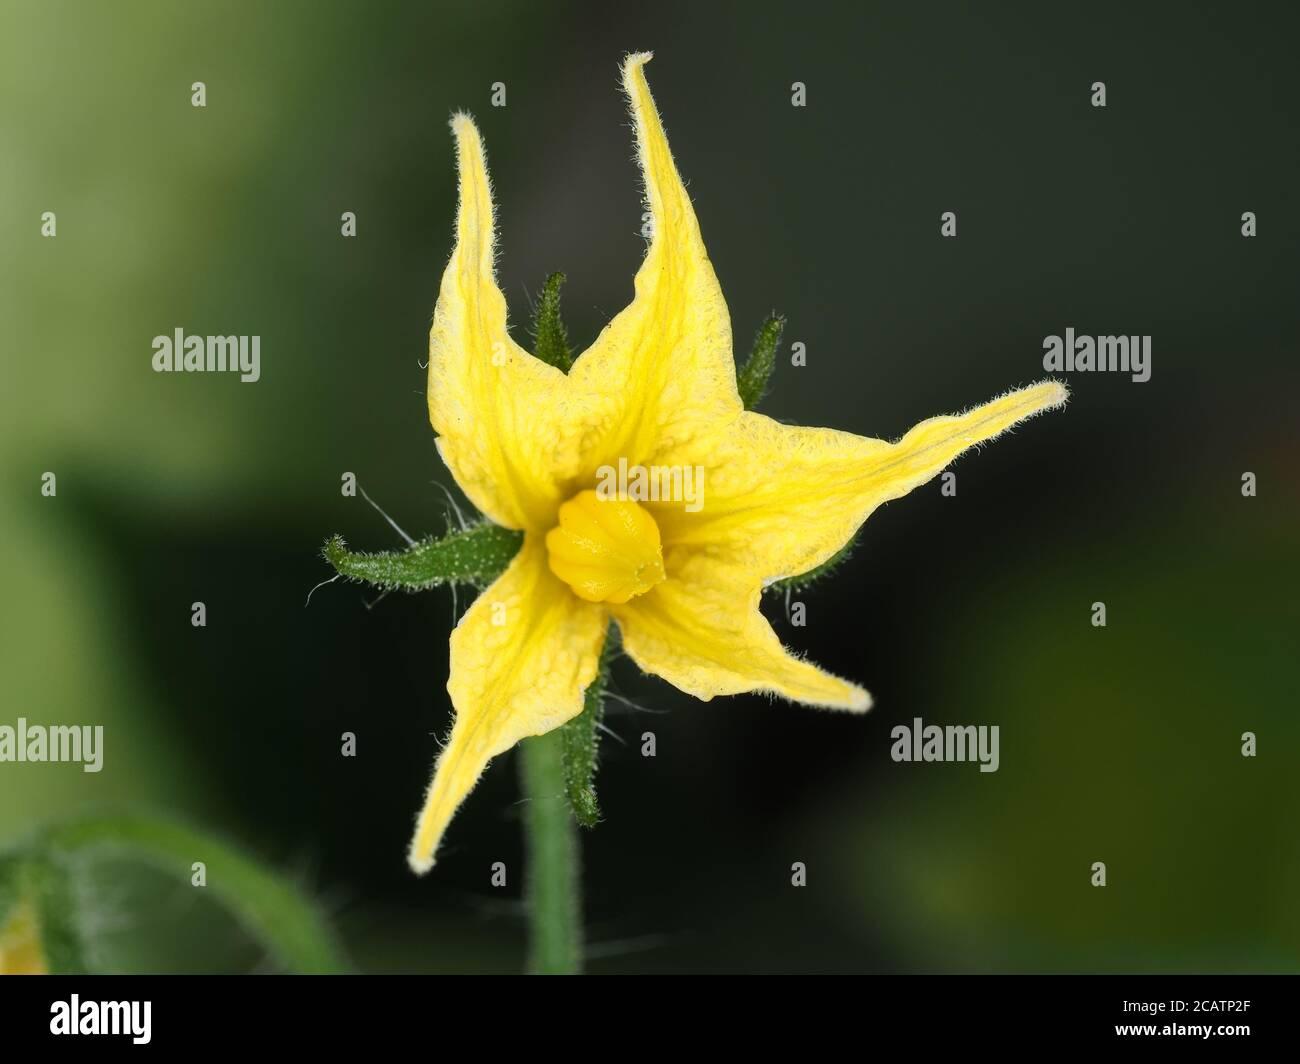 Tomato flower close-up Stock Photo